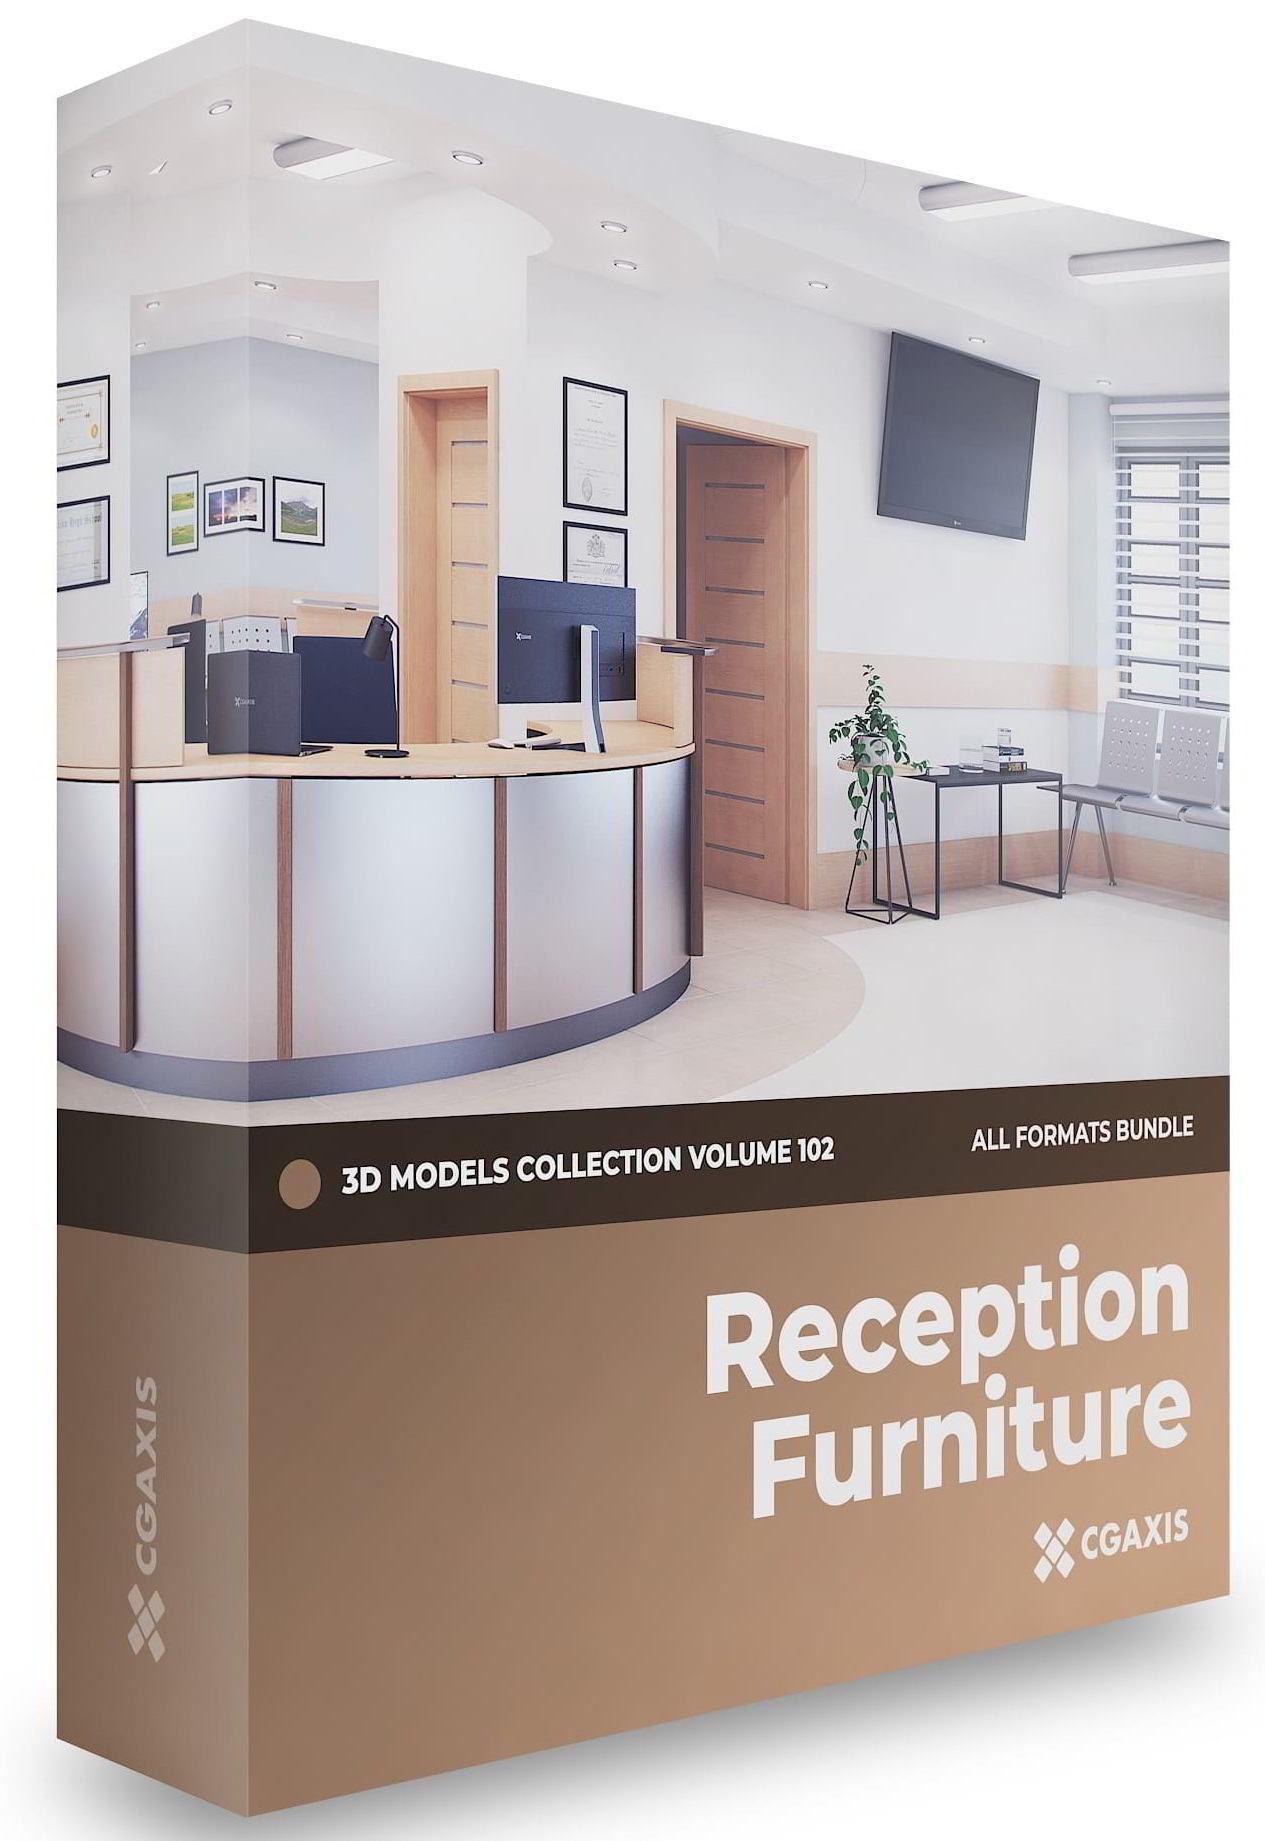 دانلود رایگان مدل سه بعدی مبلمان پذیرش Reception Furniture 3D Models Collection Volume 102